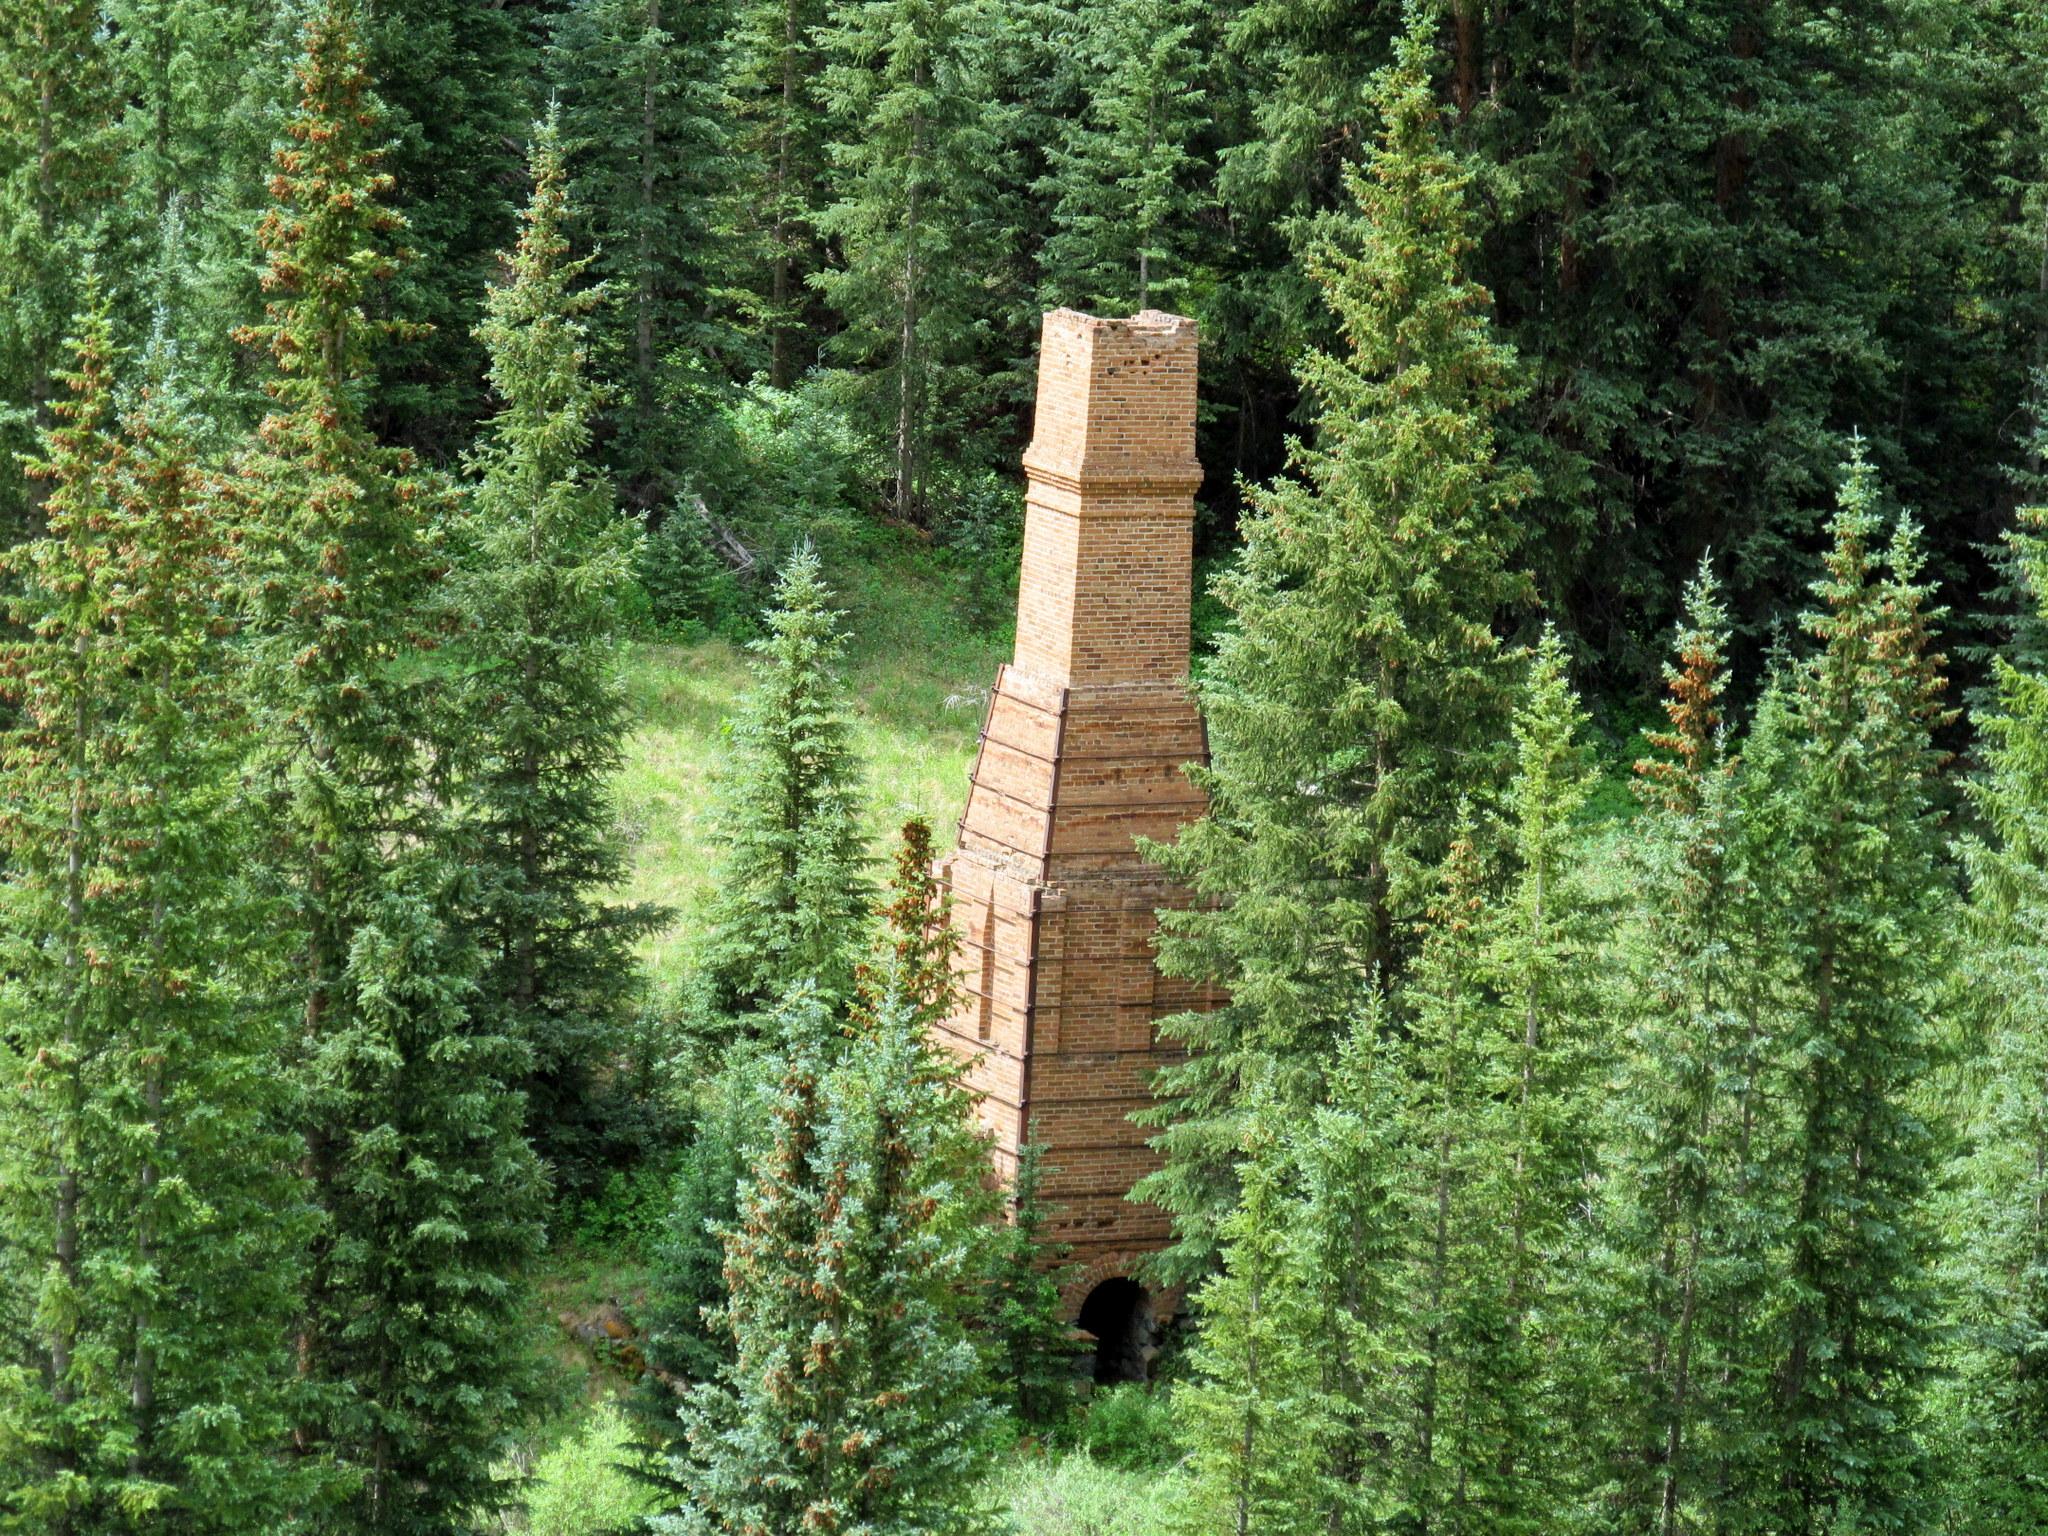 Photo: Rose lime kiln, built in 1881